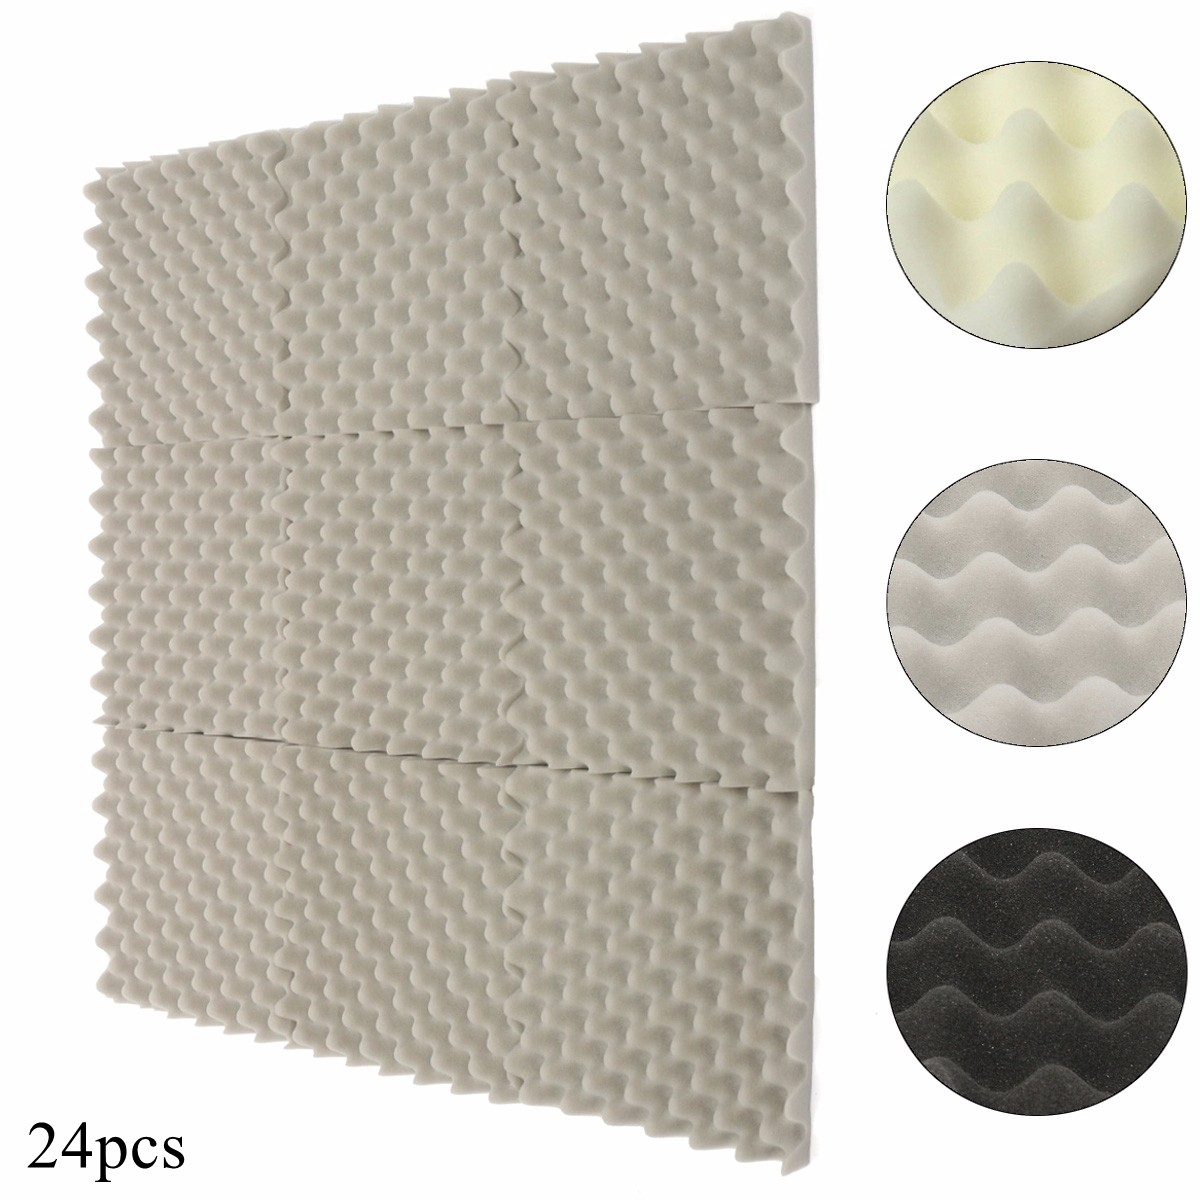 24Pcs 305x305x40mm Soundproofing Foam Acoustic Foam Sound Treatment Studio Room Absorption Wedge Tiles Polyurethane foam foam